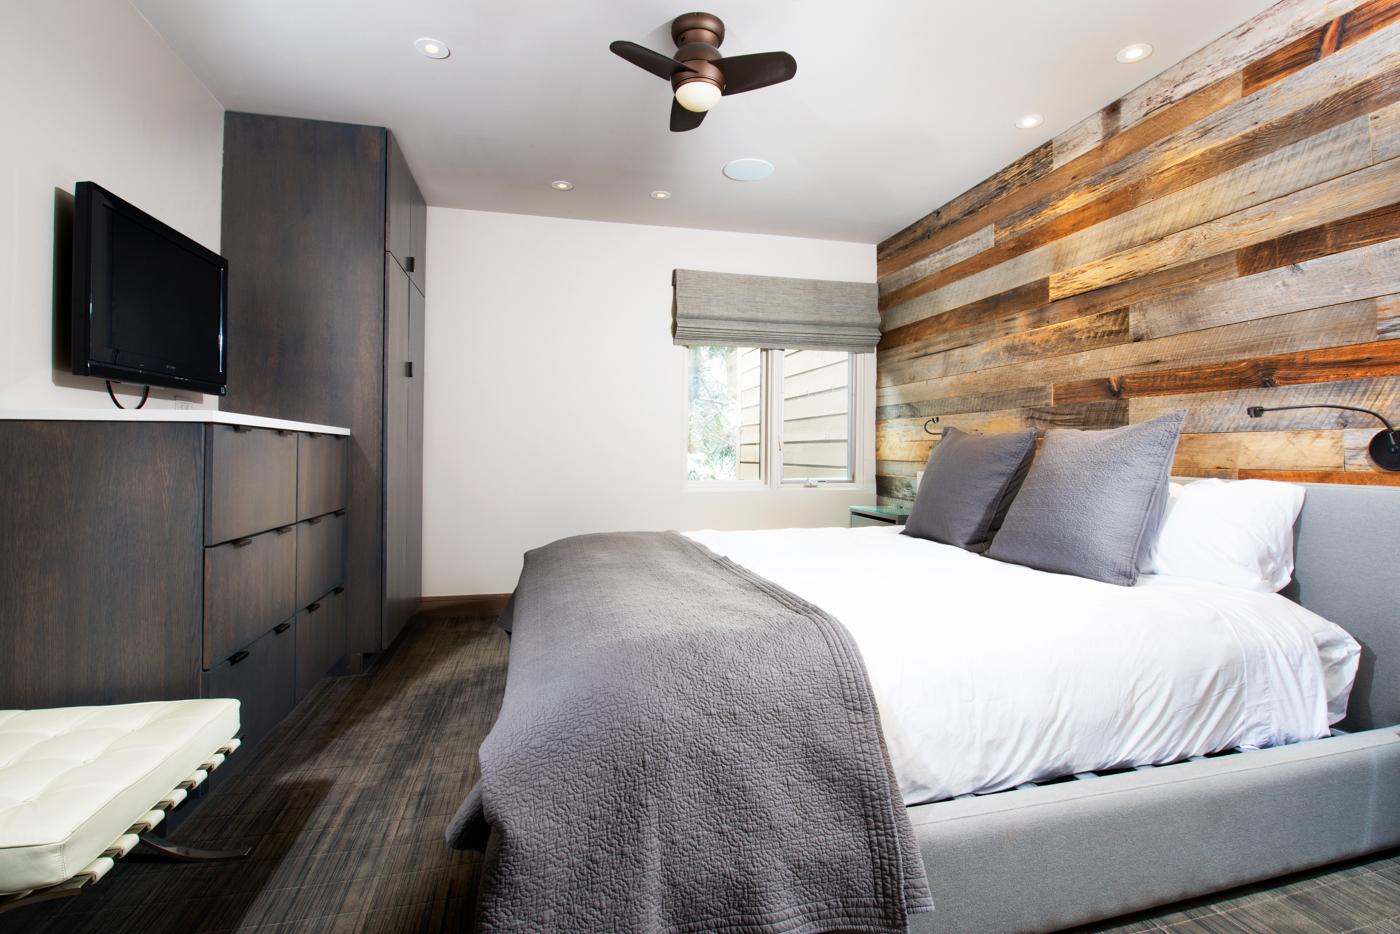 Rooms at The Gant Aspen